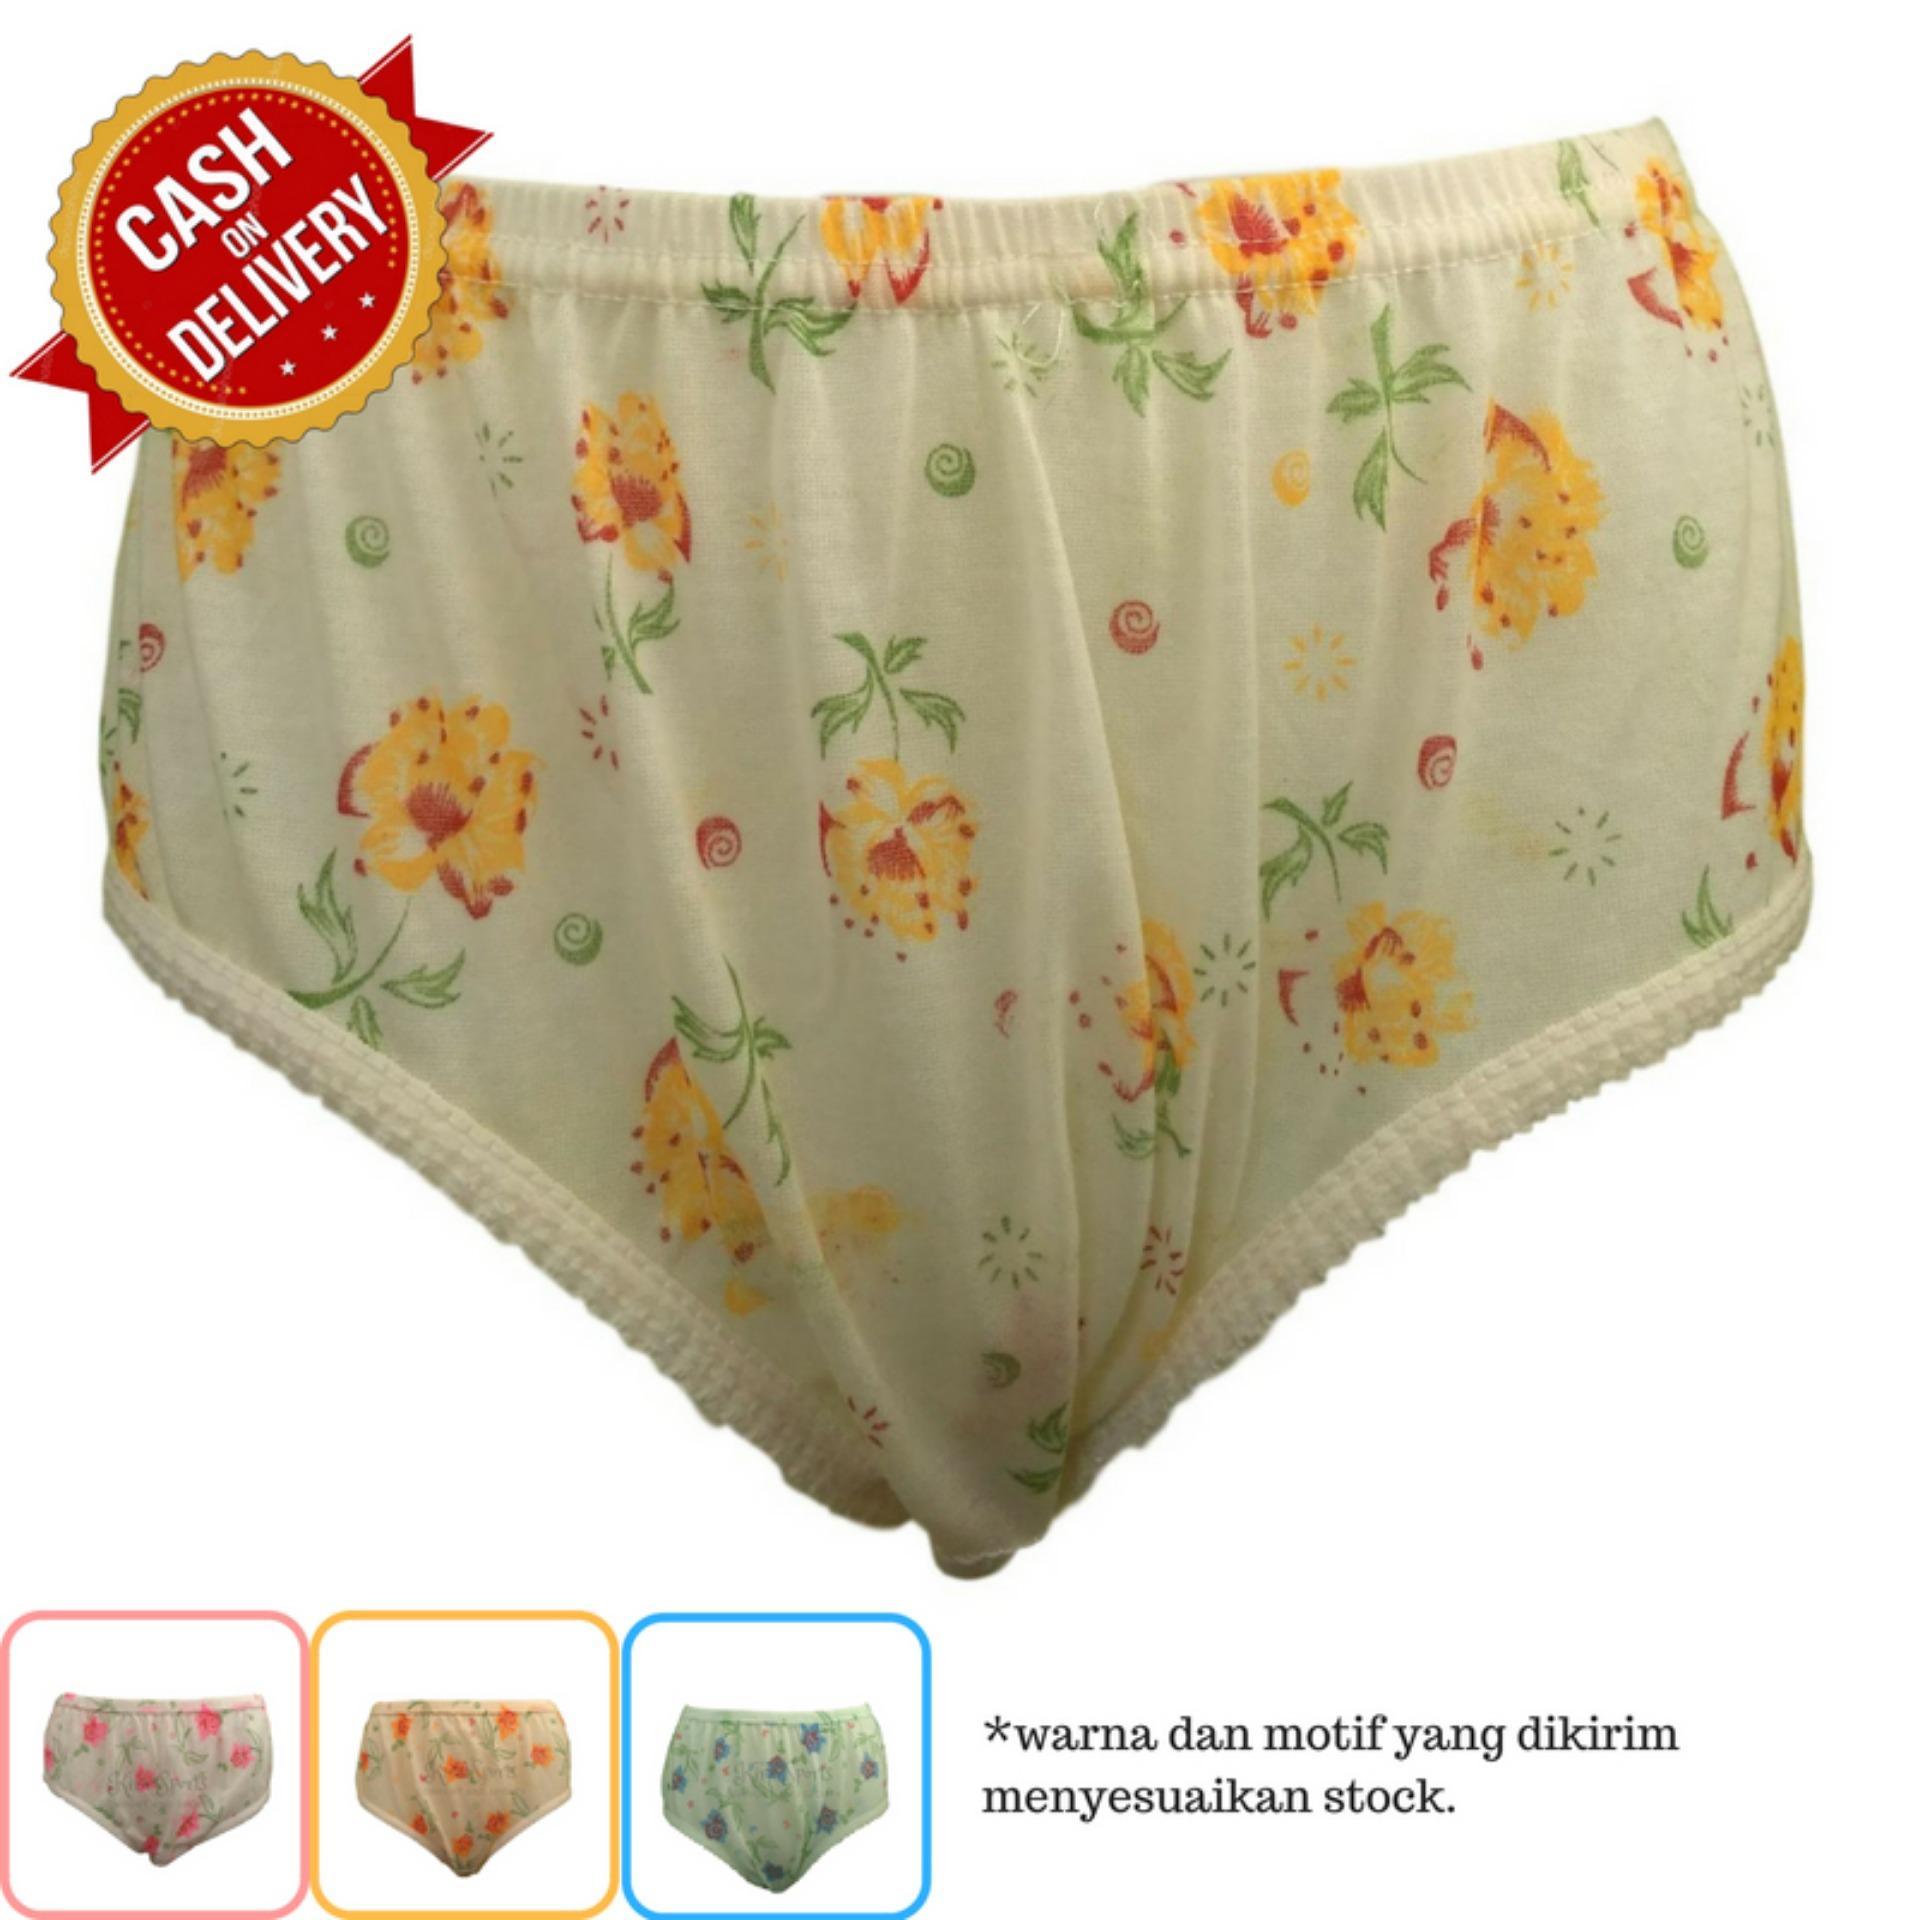 Kira Sports Celana Dalam Wanita Sexy / Bukan Merk Sorex Jumbo Transparan G-string Boxer Untuk Ibu hamil / Aneka Motif Bunga Renda Seksi Terbaru/ Dalaman Perempuan Katun Dewasa Murah ANK708 - Bisa COD